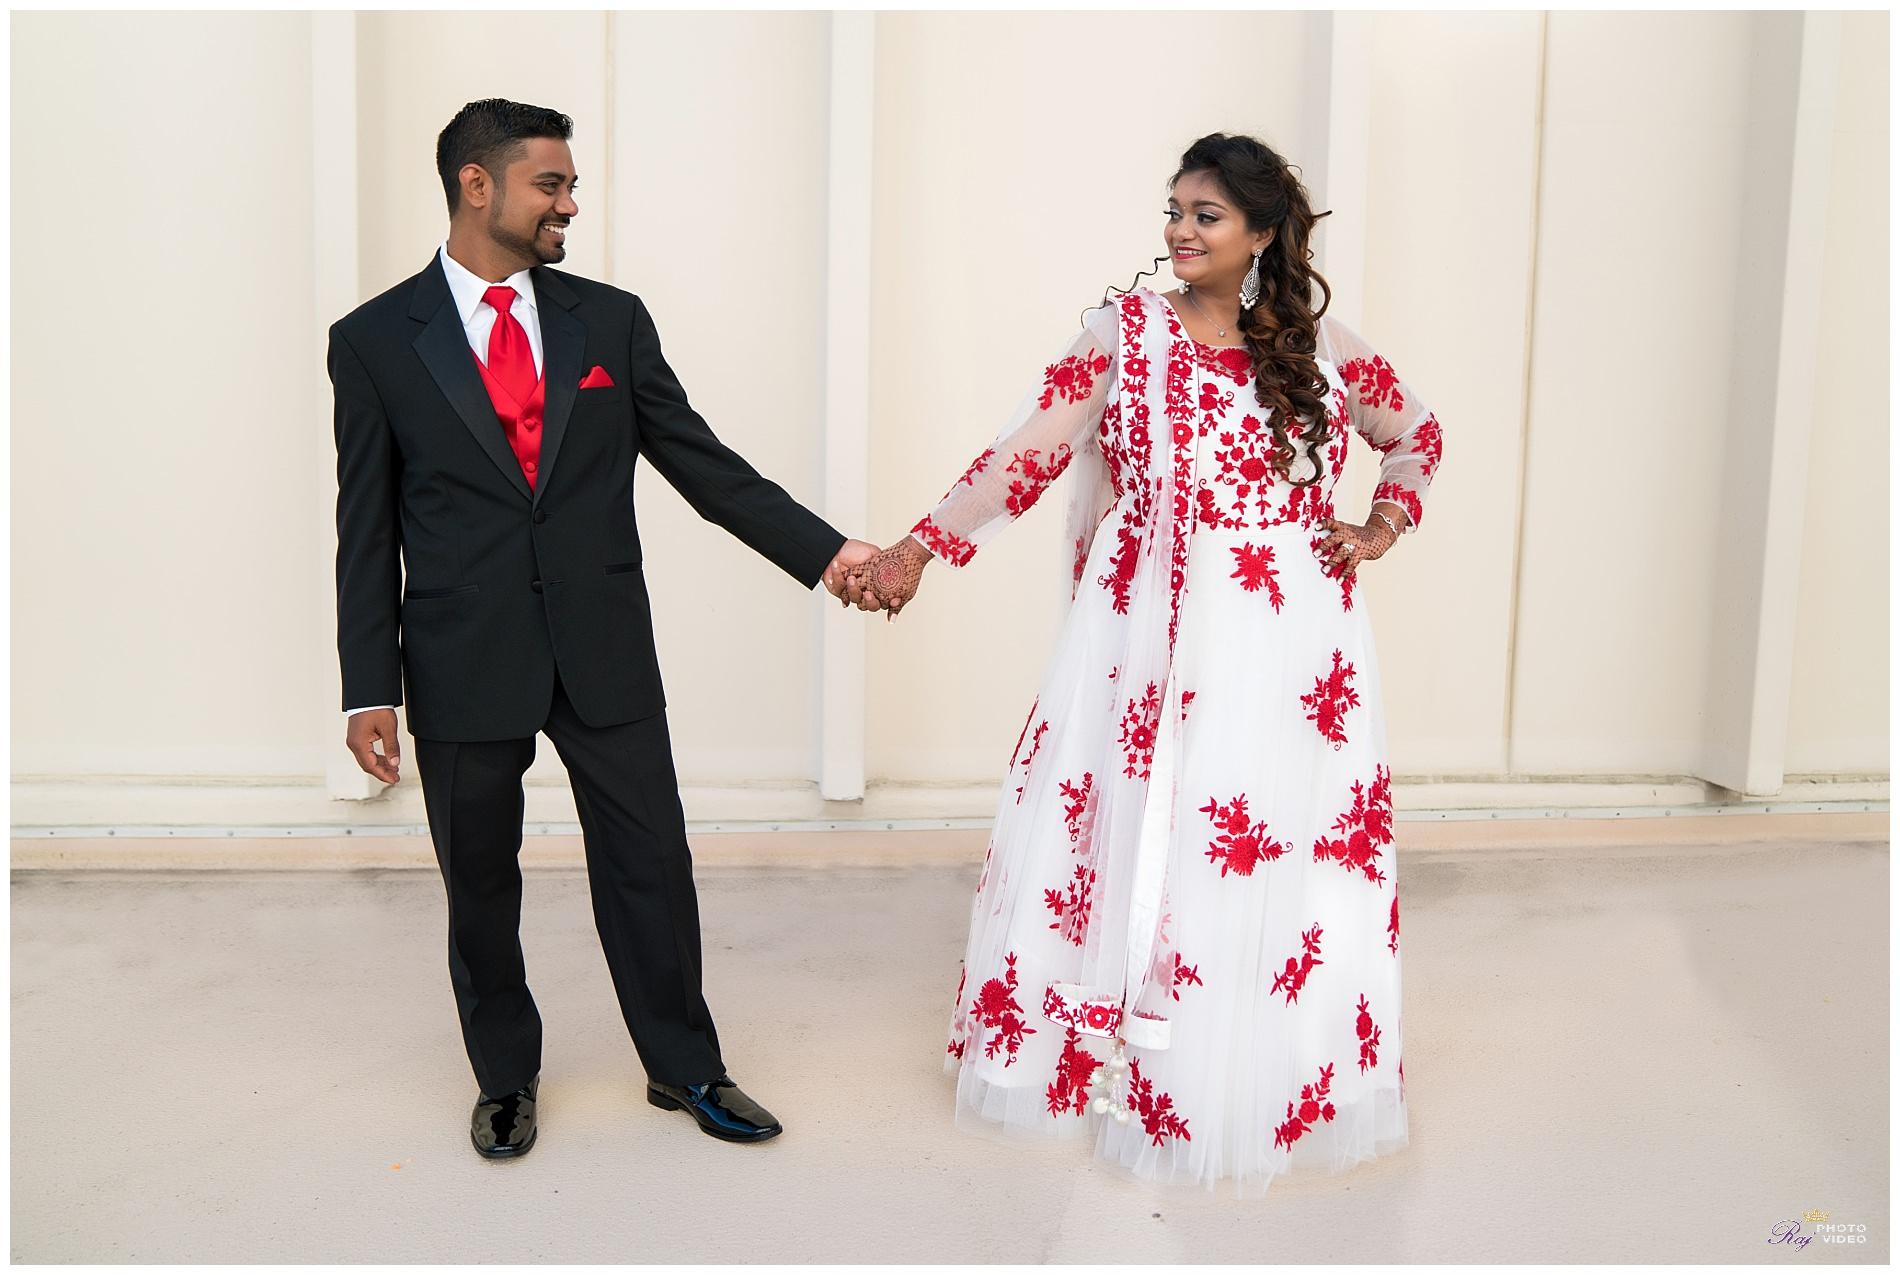 doubletree-by-hilton-hotel-wilmington-de-wedding-krishna-ritesh-80.jpg